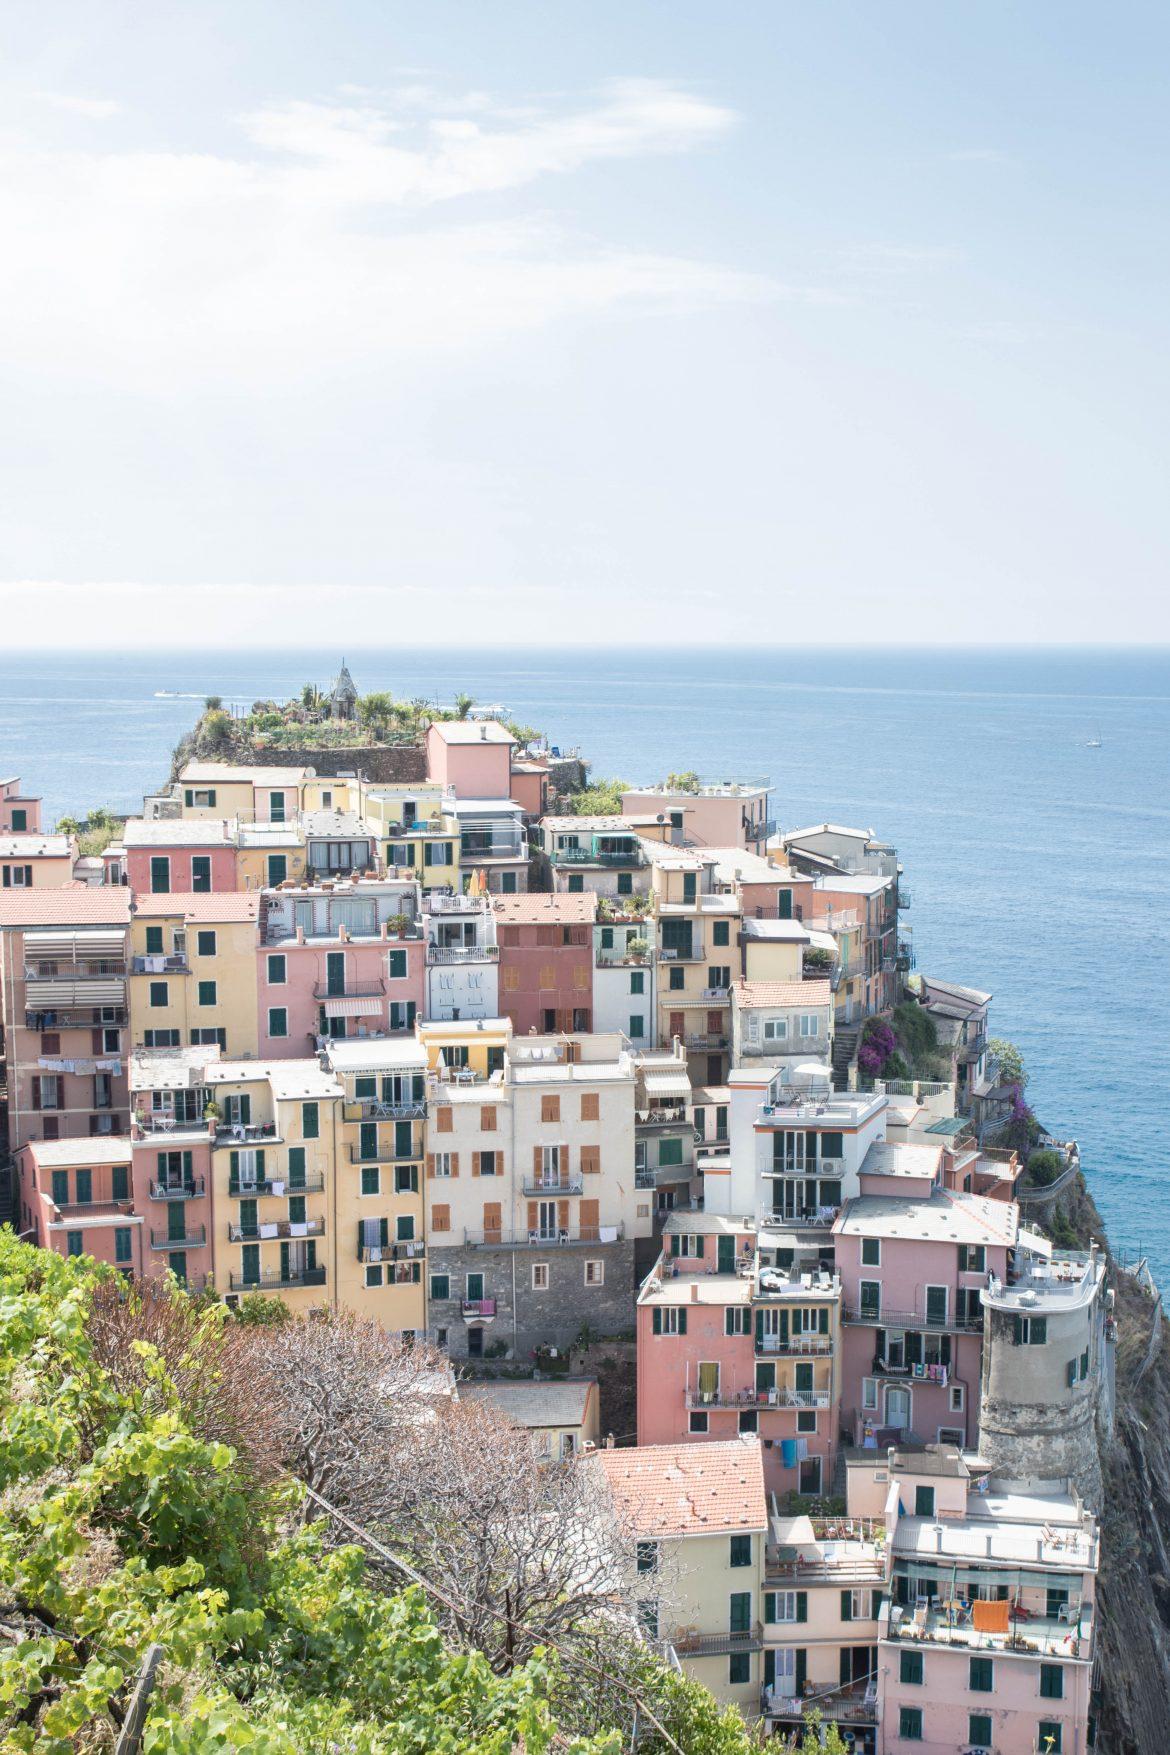 Manorola cinque terre Italie